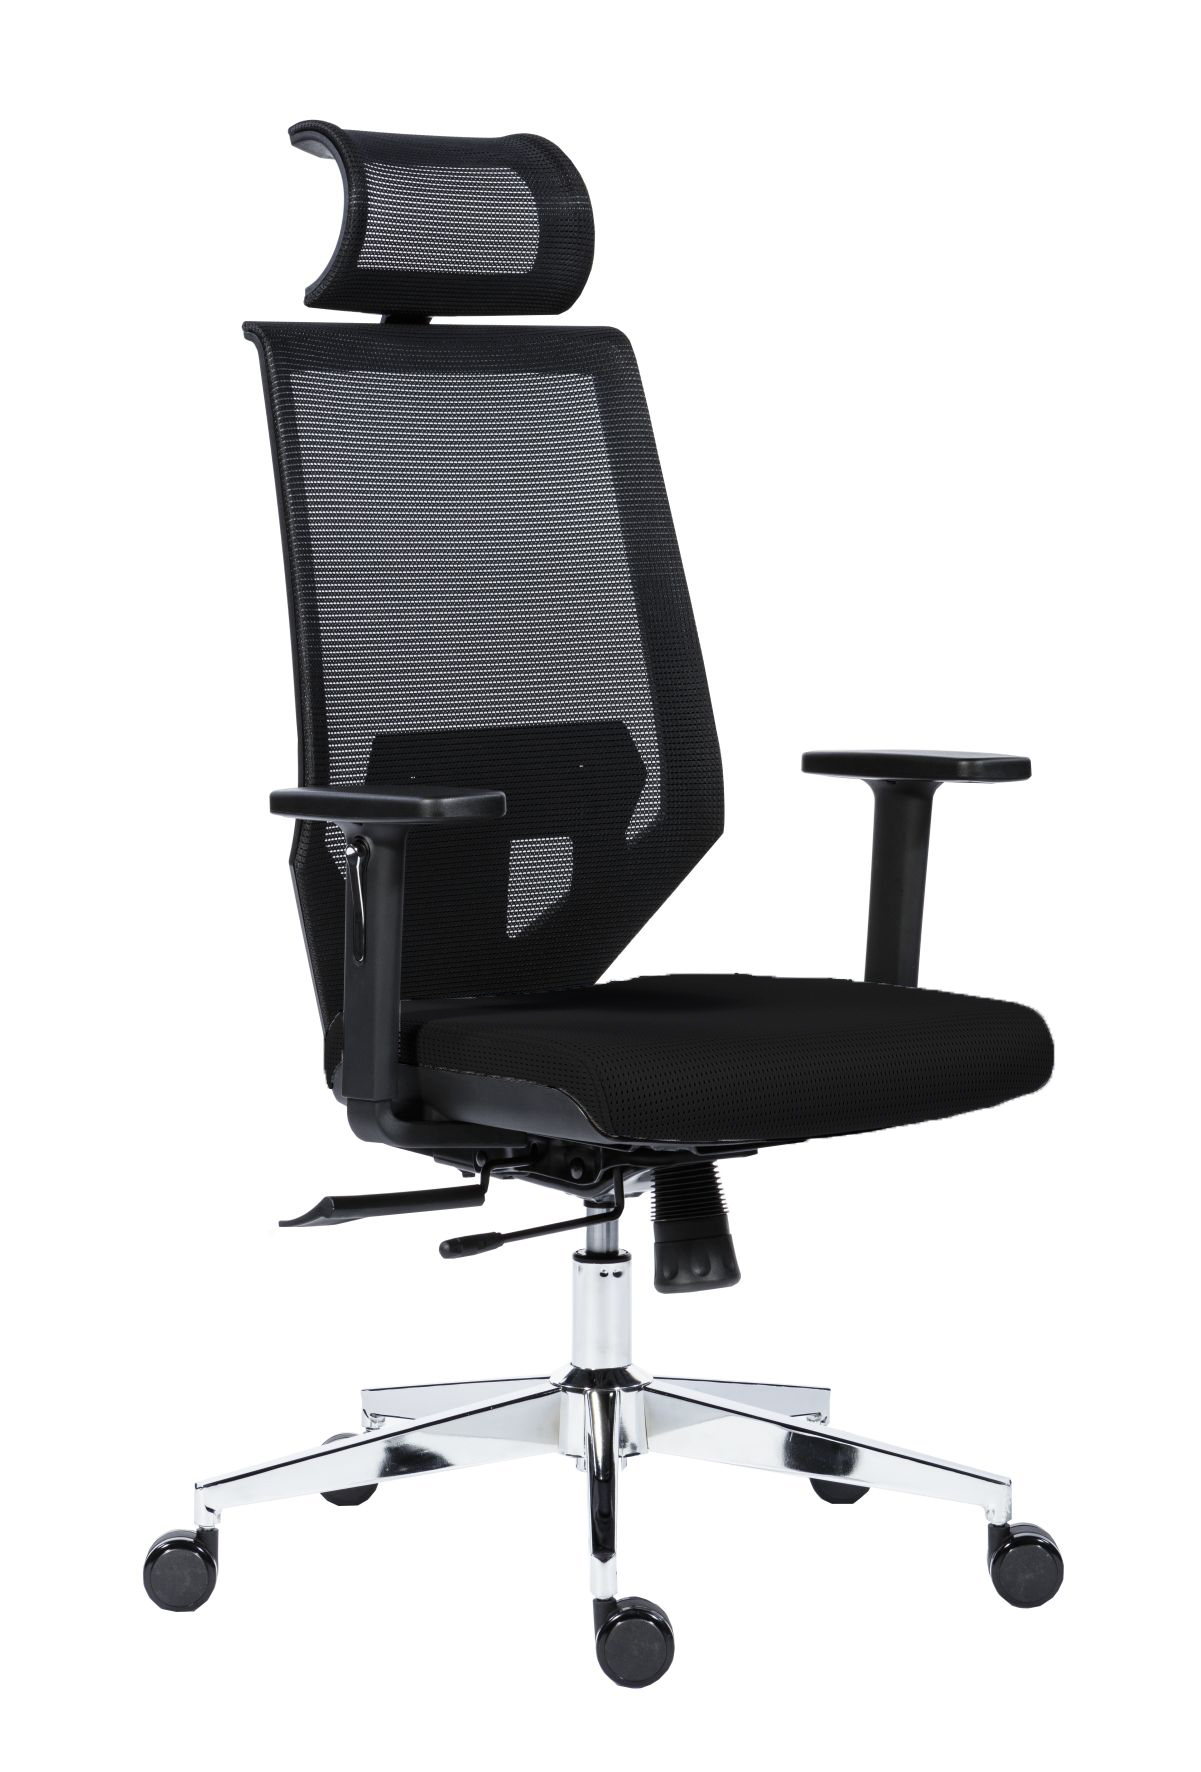 ANTARES Kancelářská židle EDGE černá Antares